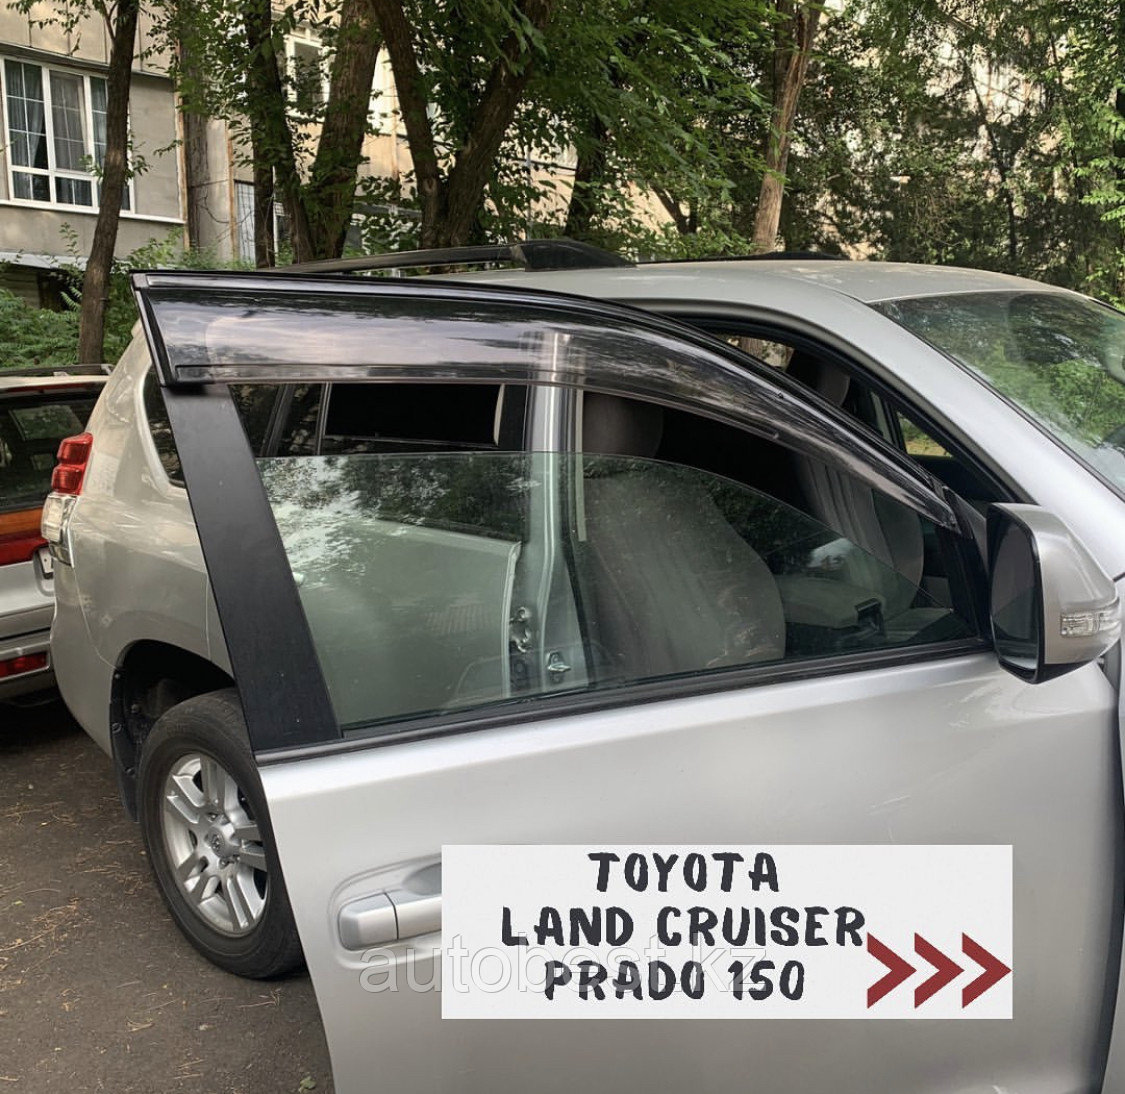 Широкие прозрачные Ветровики на Toyota Land Cruiser Prado 150  Ленд Крузер Прадо